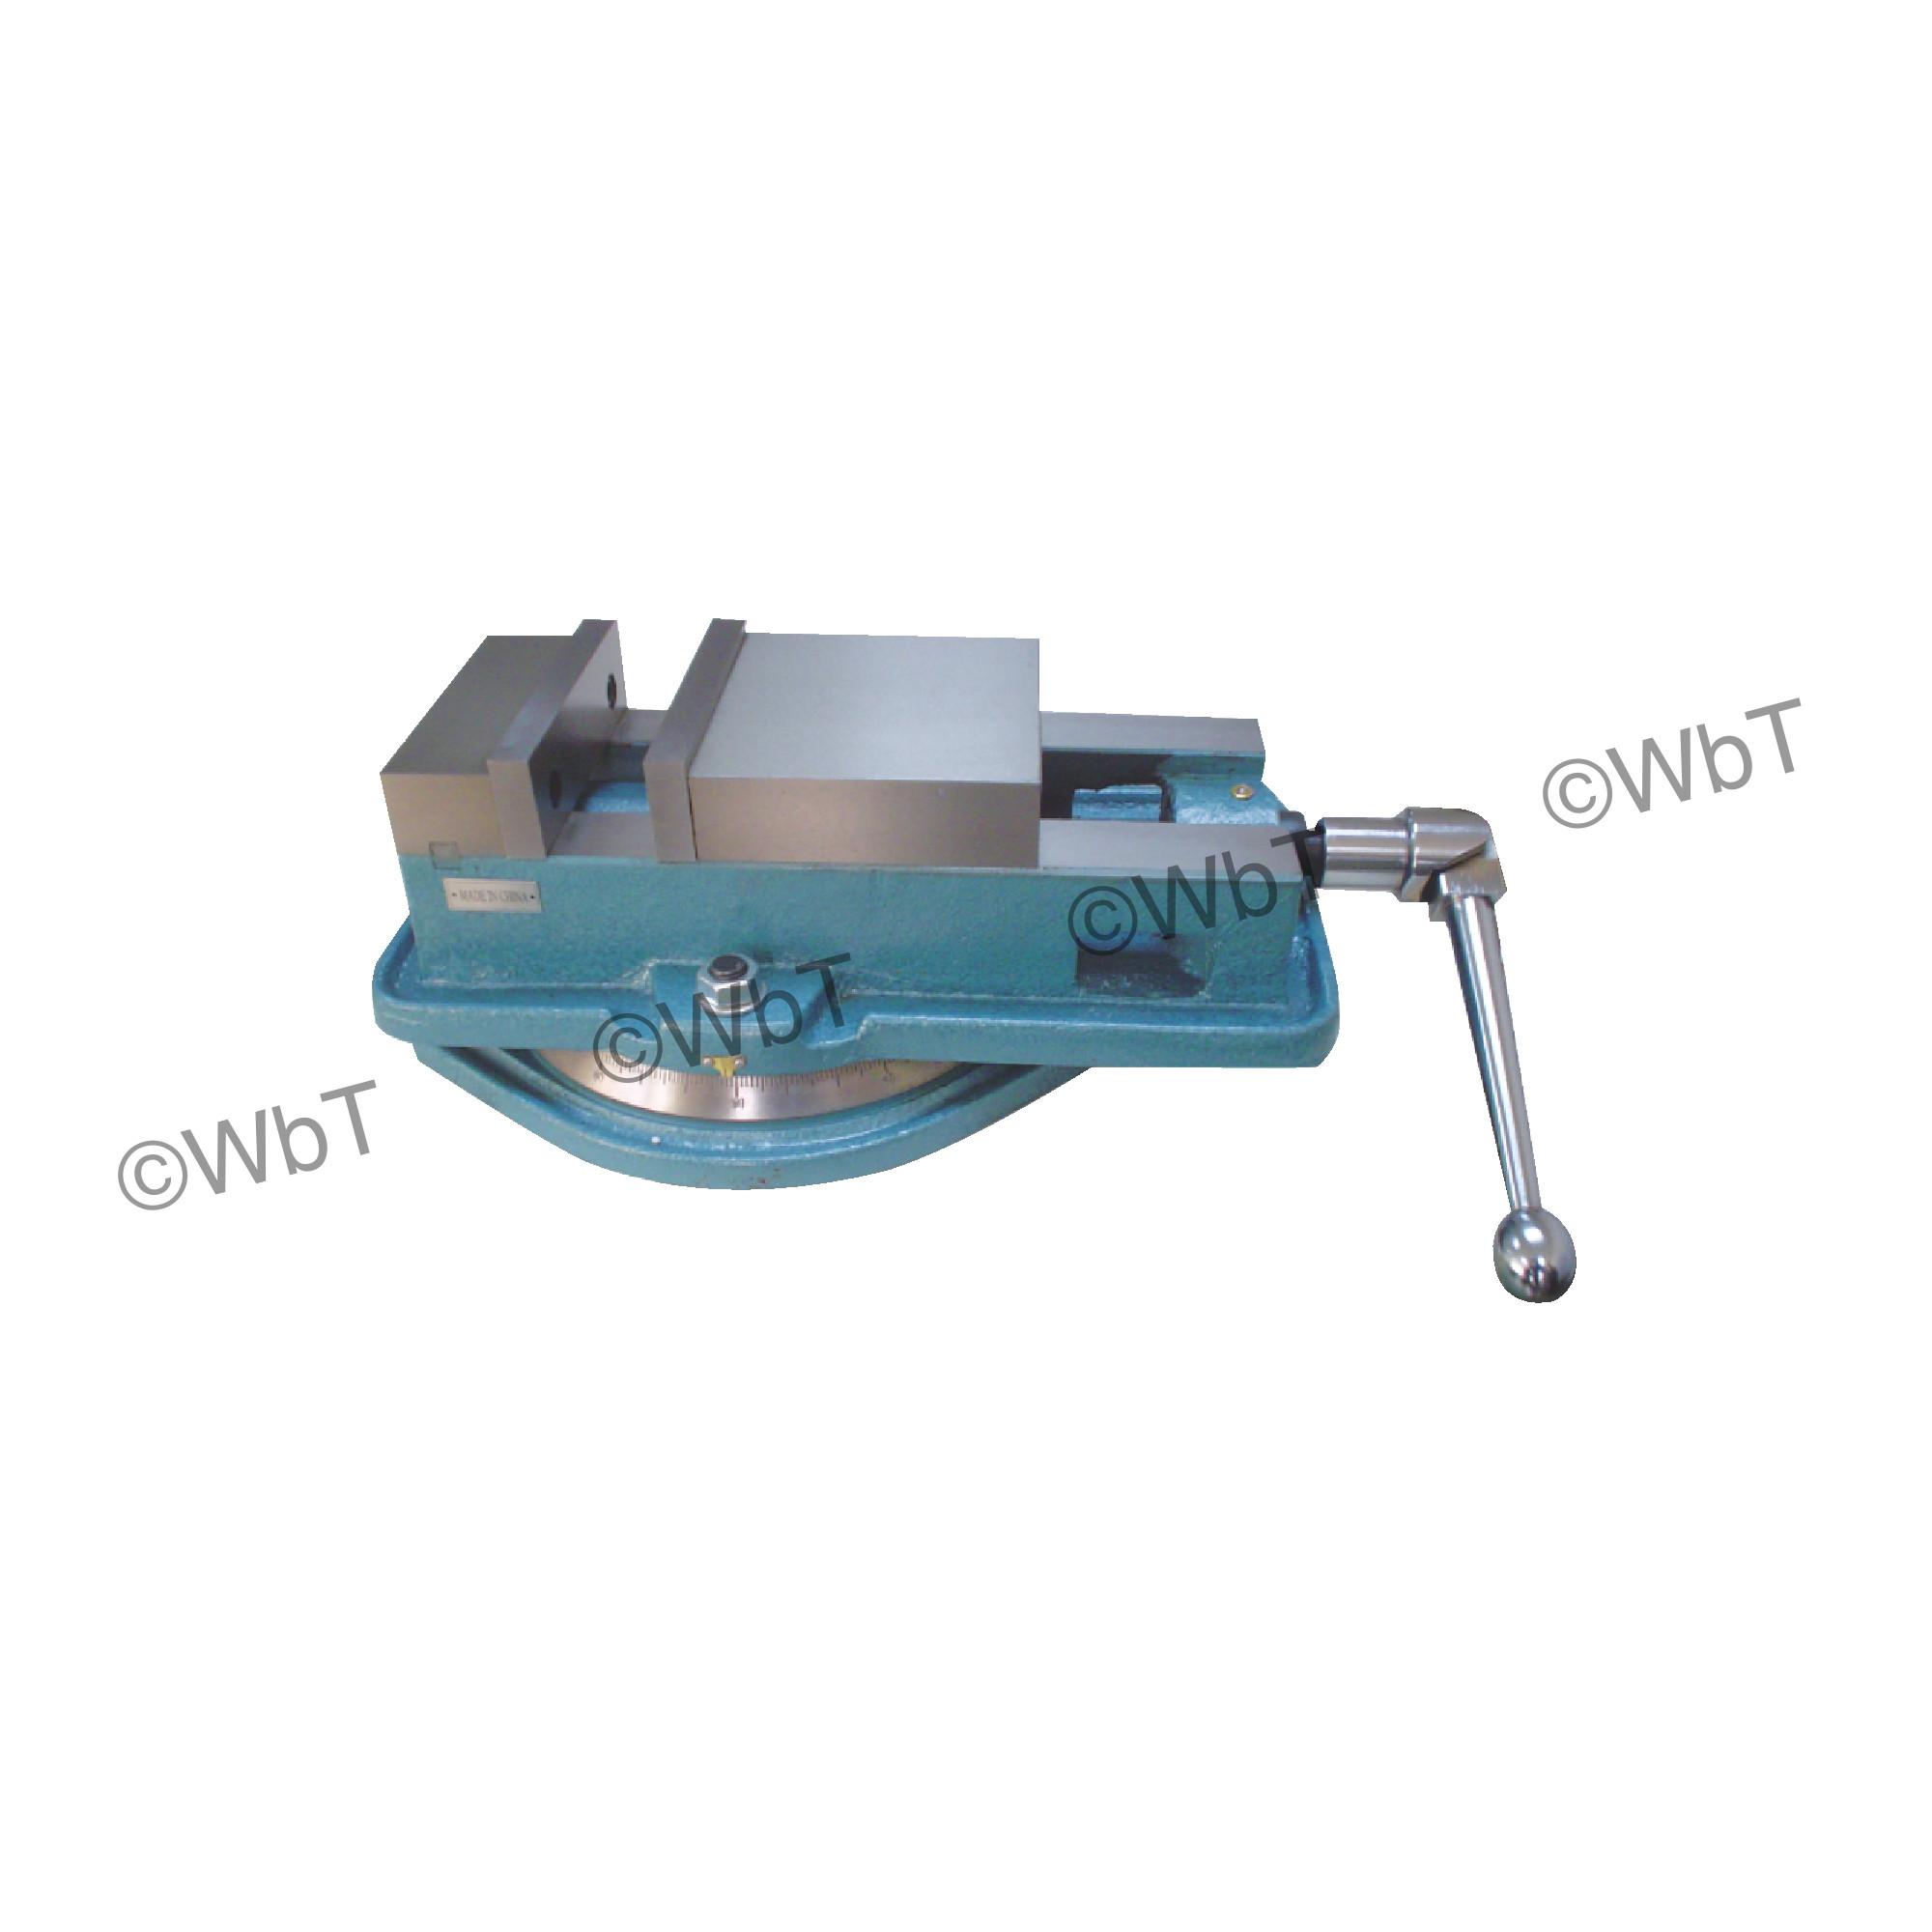 Precision Swivel Base Milling Machine Vise